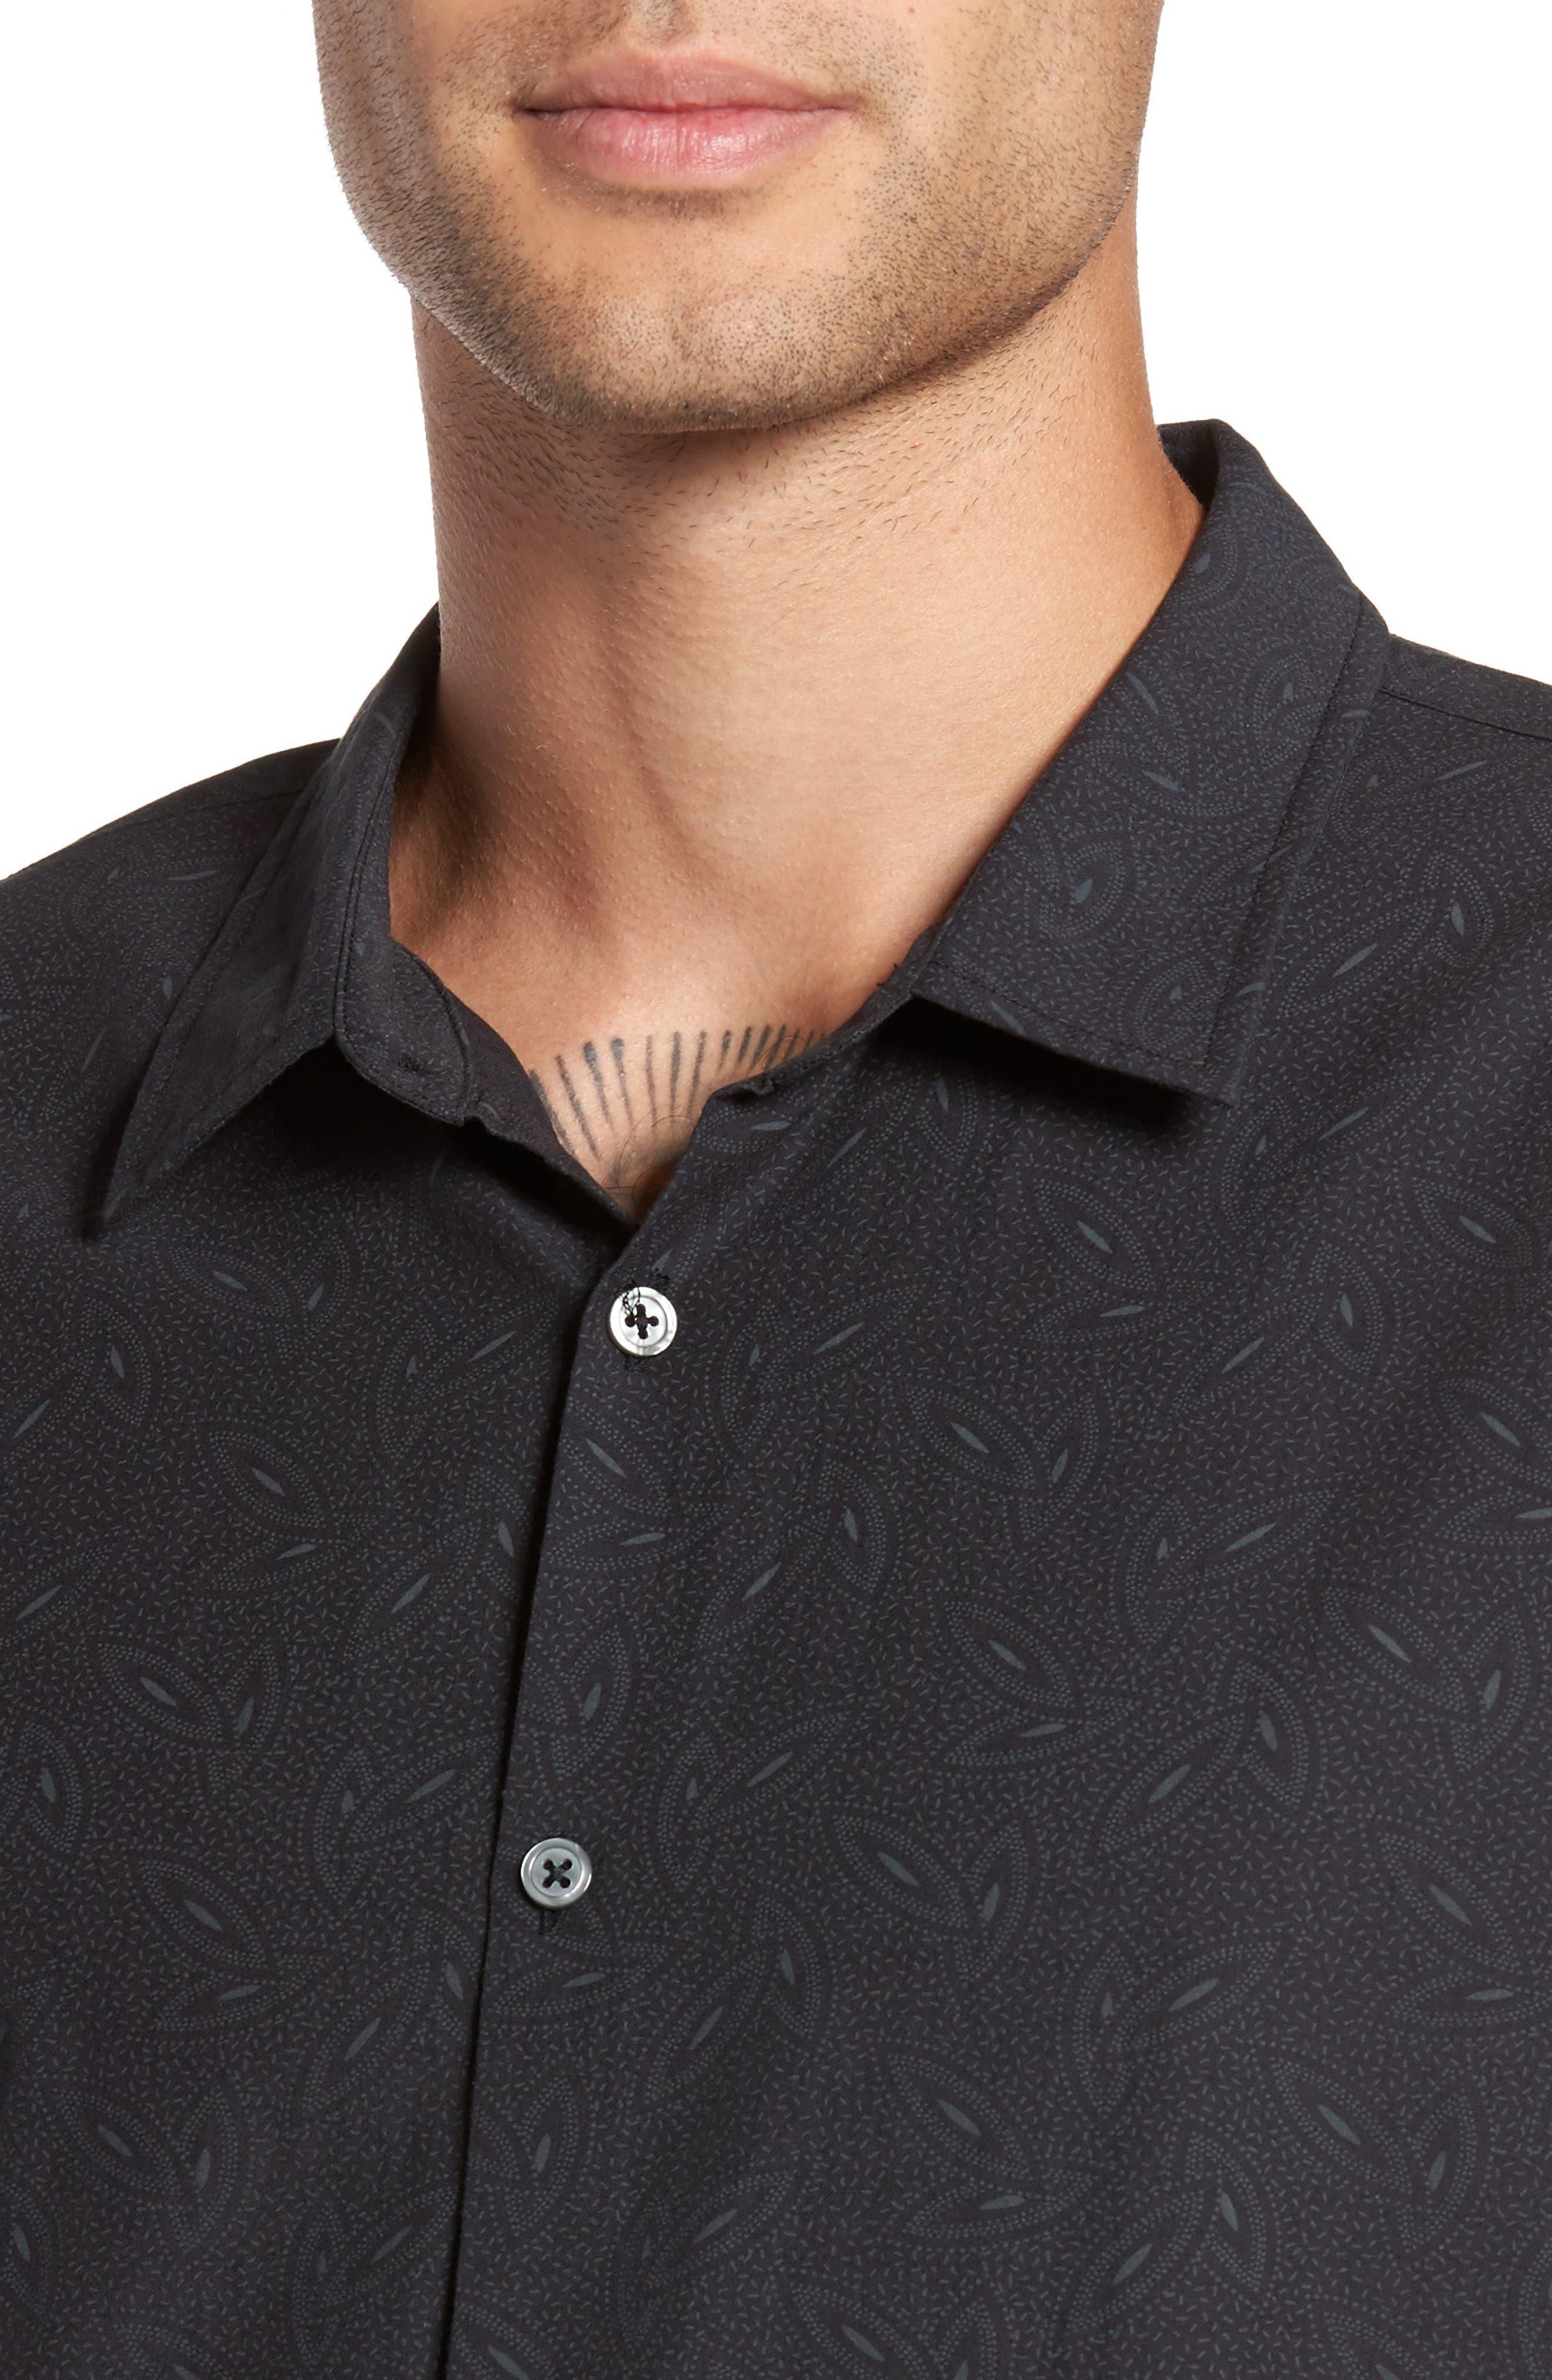 Mayfield Slim Fit Short Sleeve Sport Shirt,                             Alternate thumbnail 2, color,                             Midnight